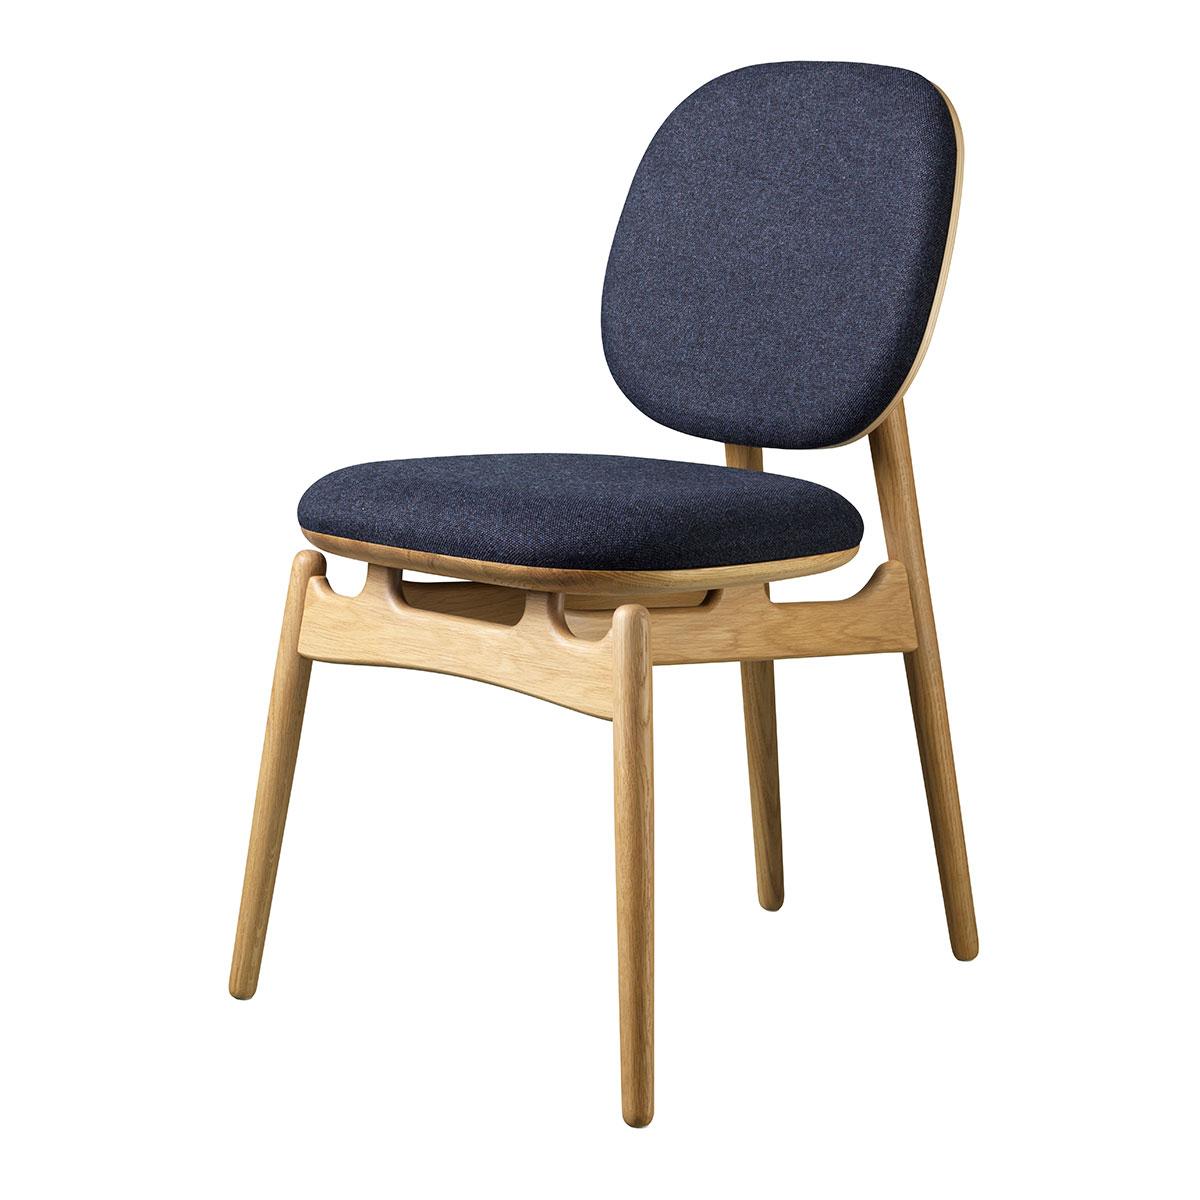 Image of   Hans-Christian Bauer stol - J161 PoSpiSto - Eg/mørkeblåt tekstil